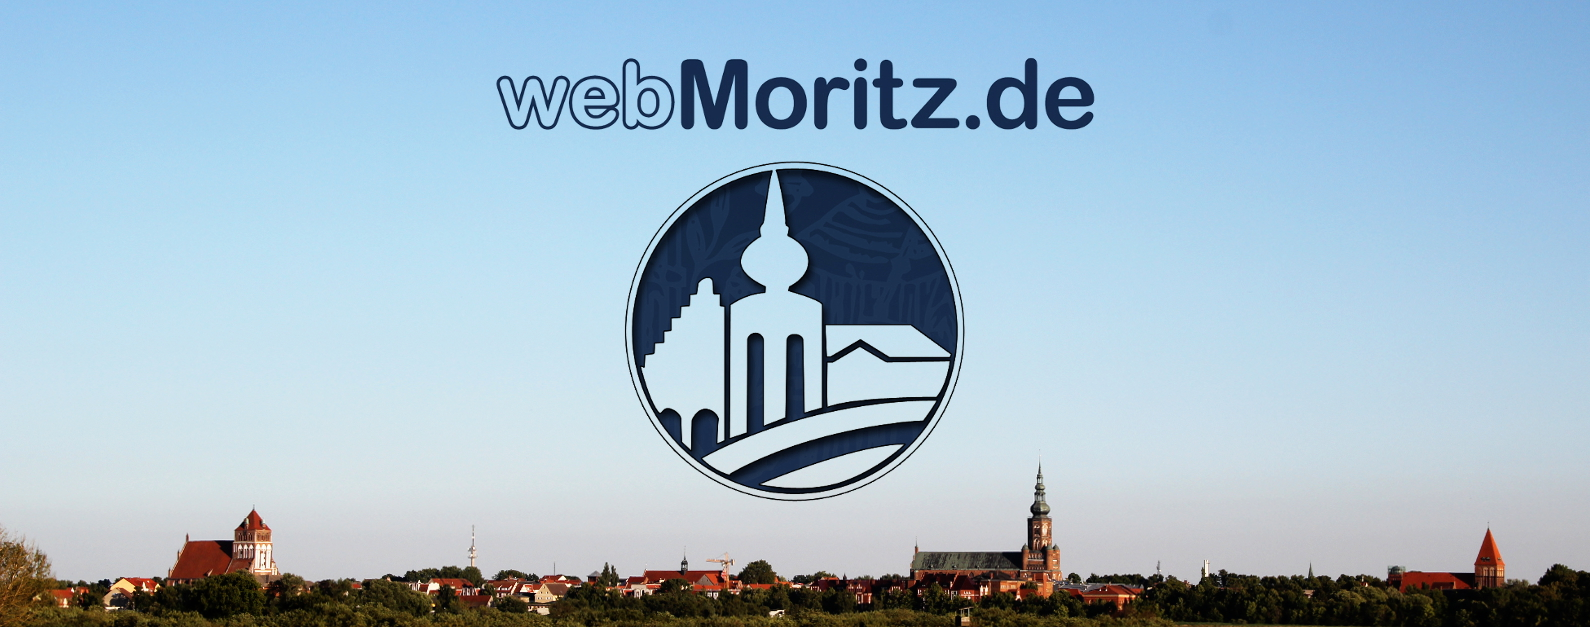 CDF_Blick_Webmoritz